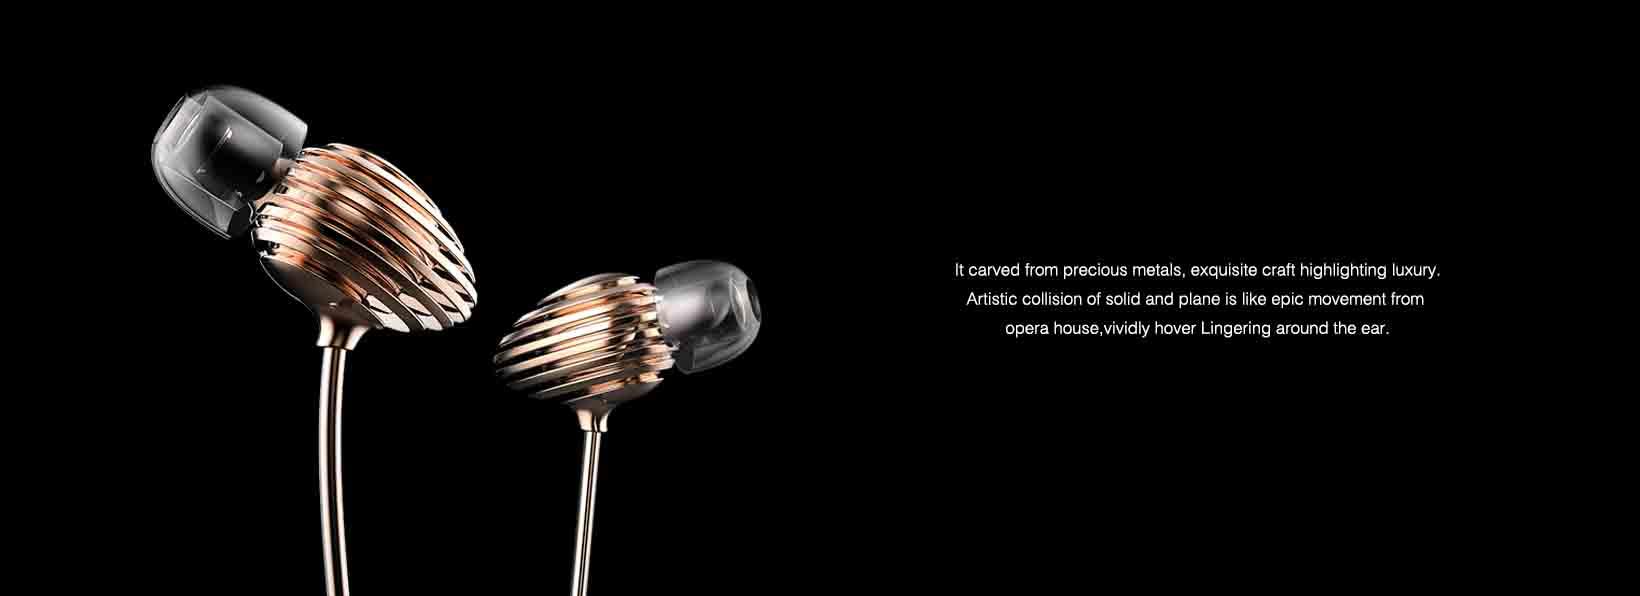 1 level贵金属高端定制耳机